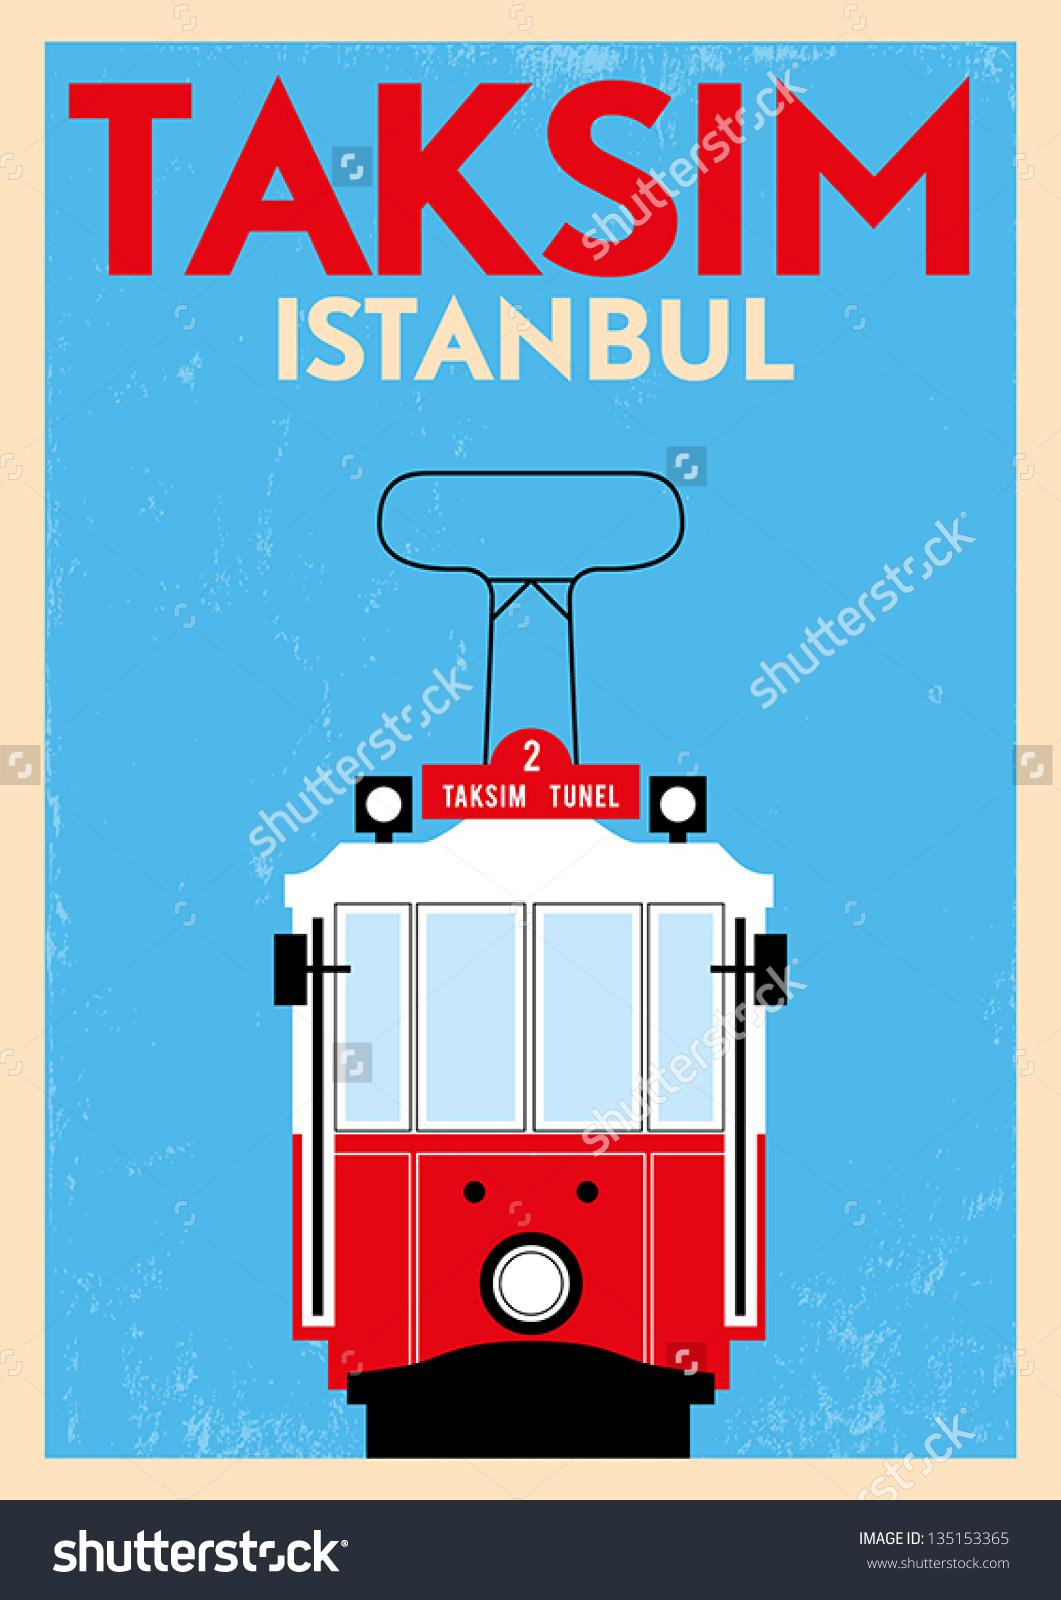 Vintage Taksim Poster Stock Vector Illustration 135153365.